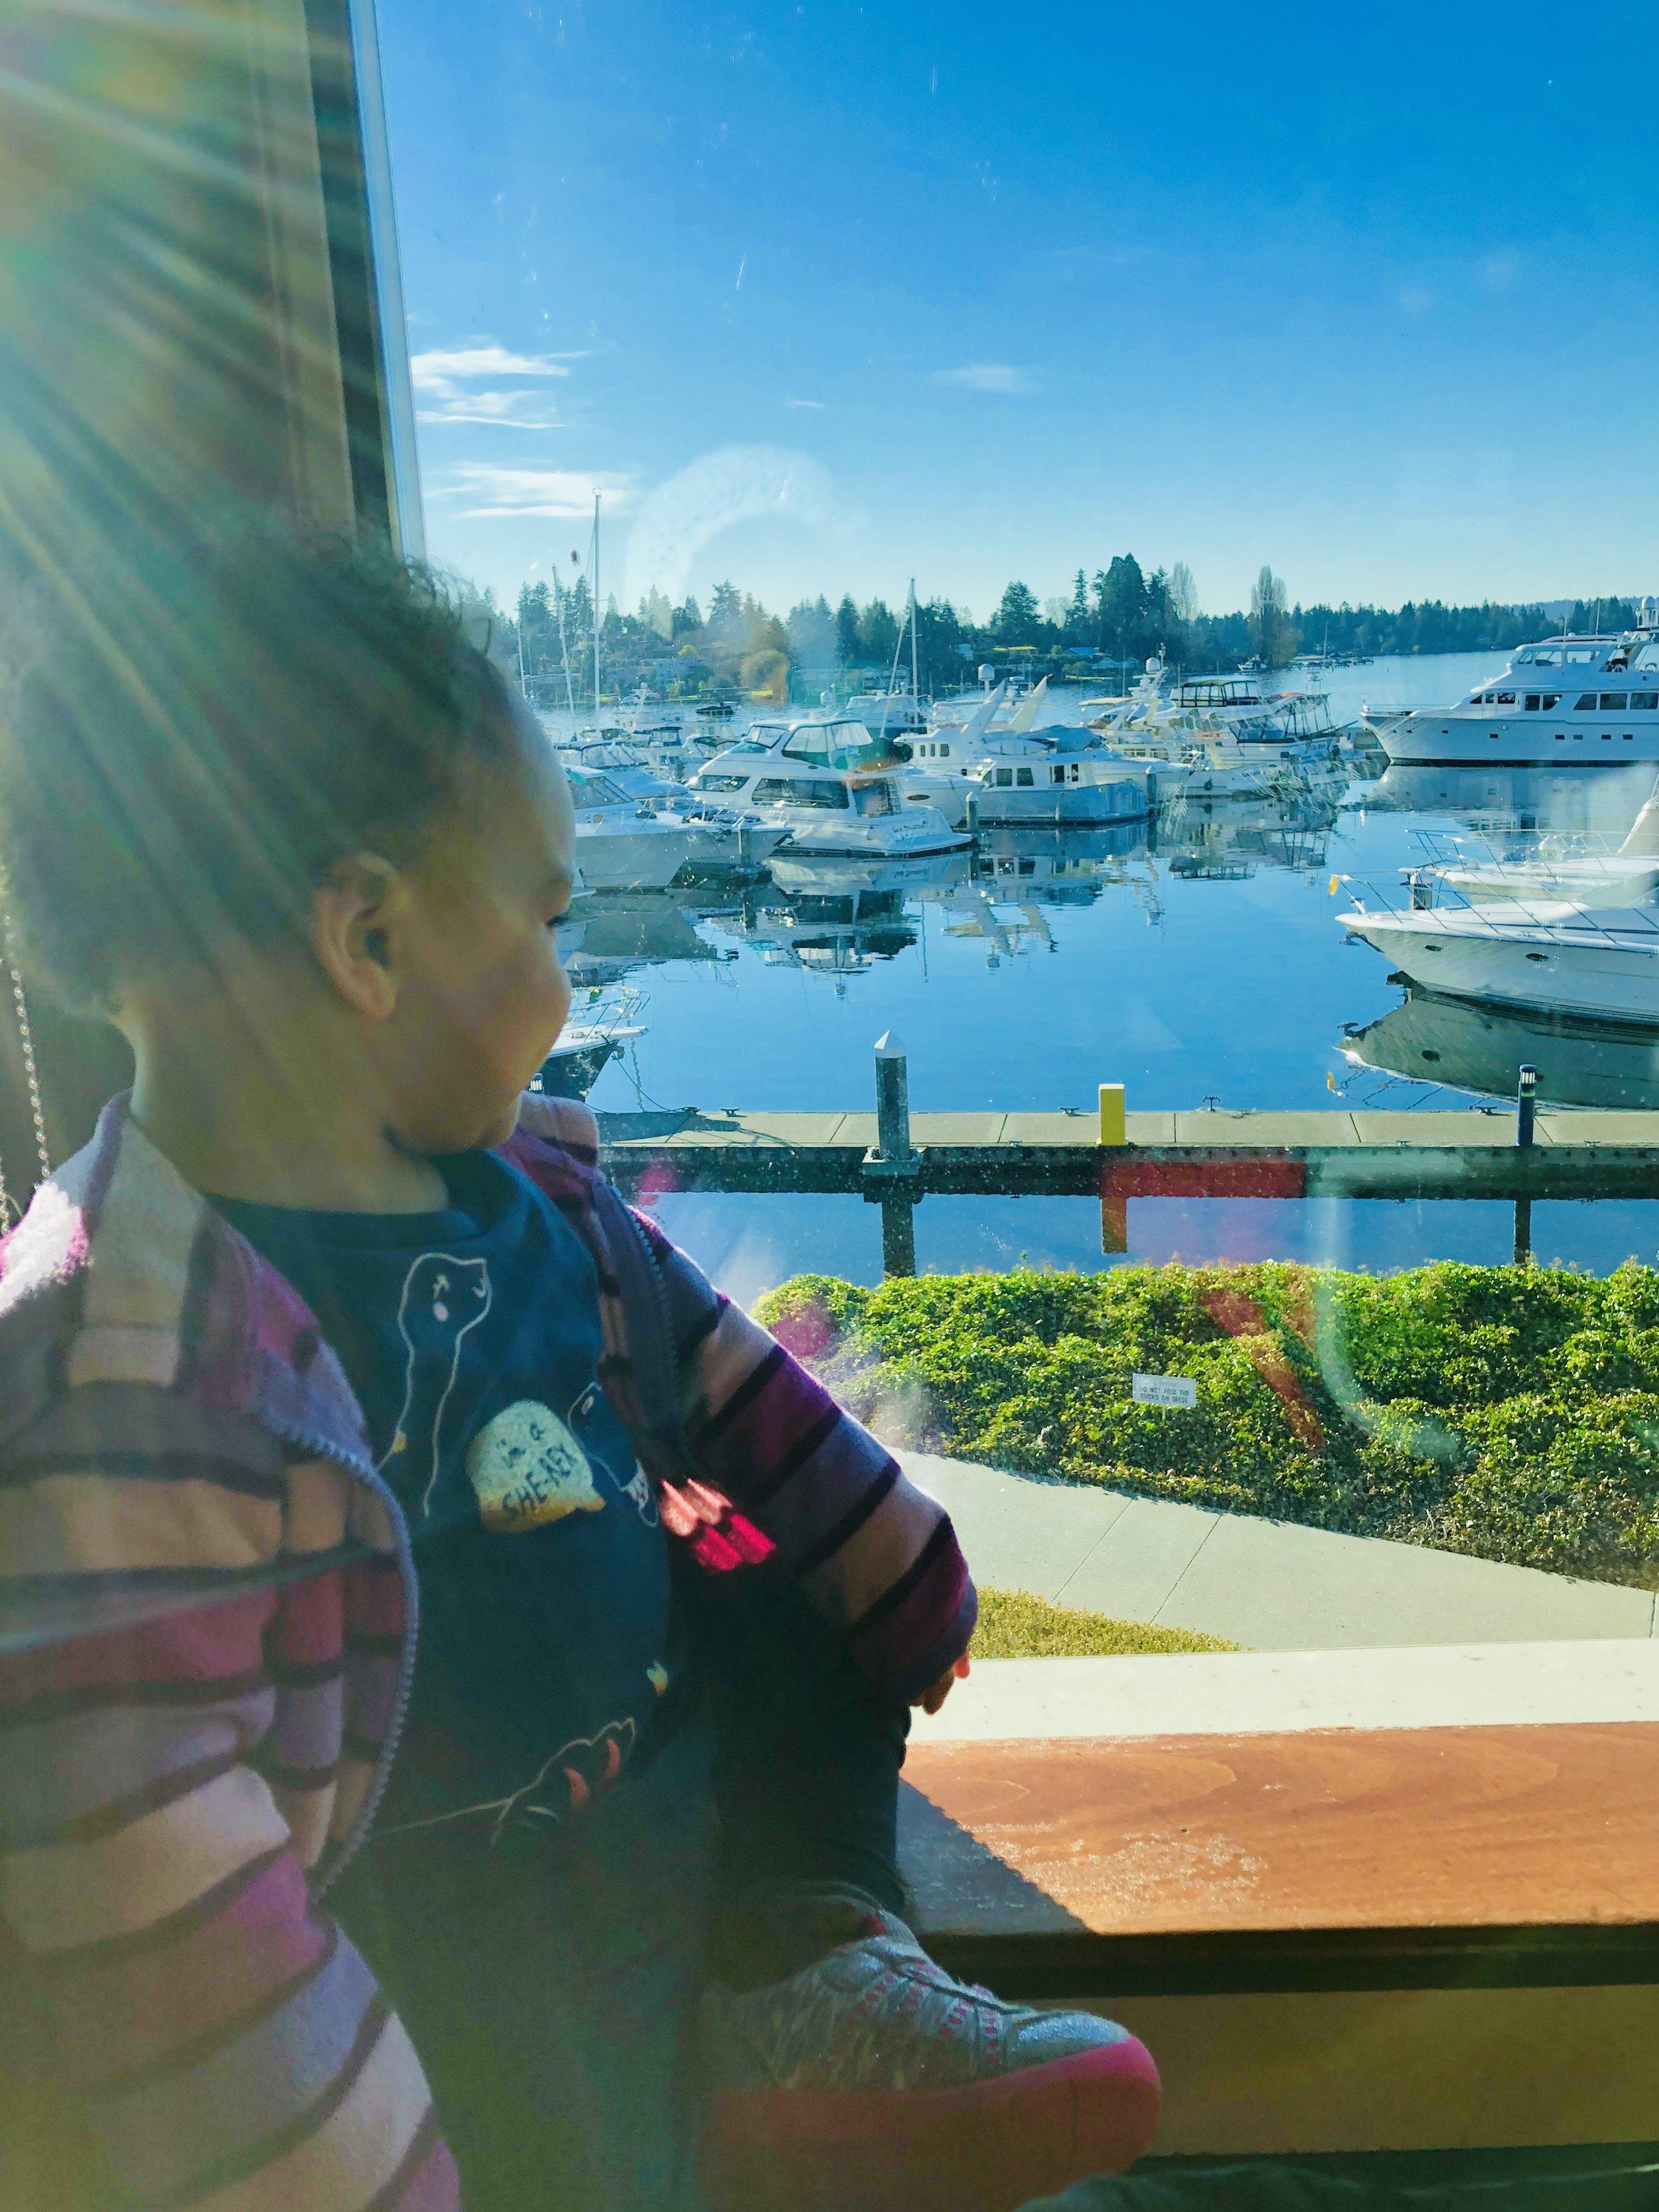 Miah taking in the Kirkland, Washington views like a boss.